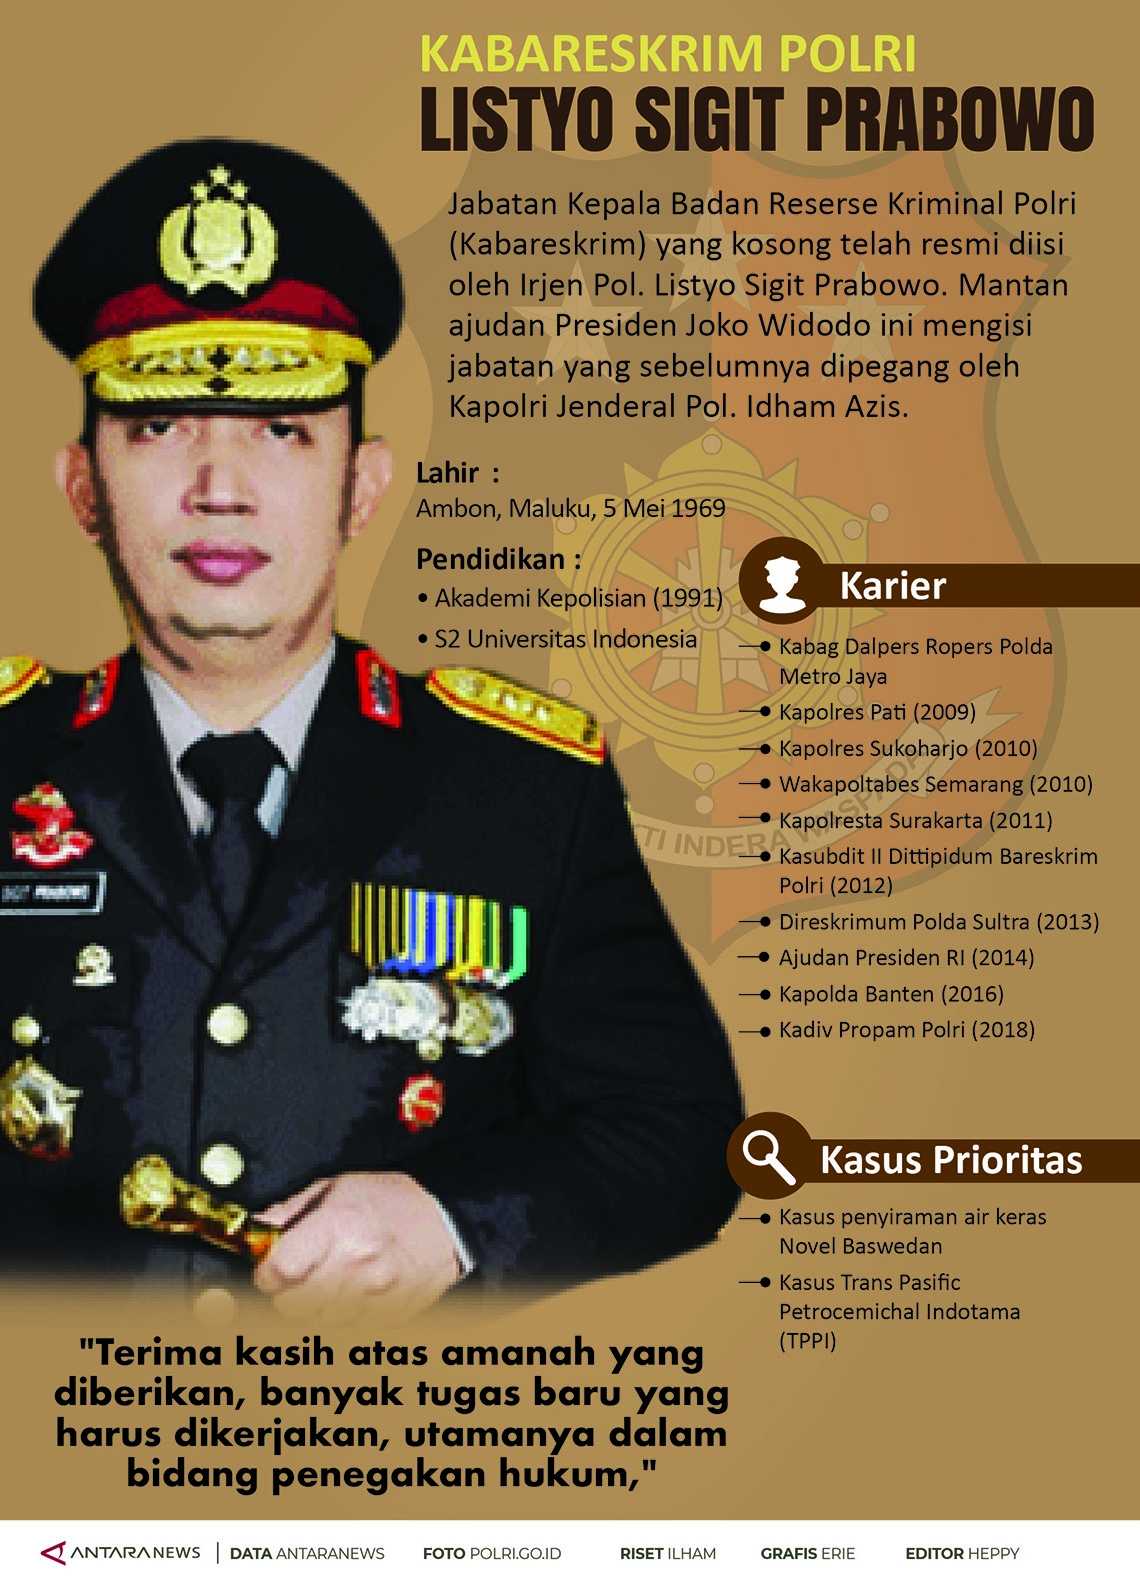 Profil Kabareskrim Polri Listyo Sigit Prabowo